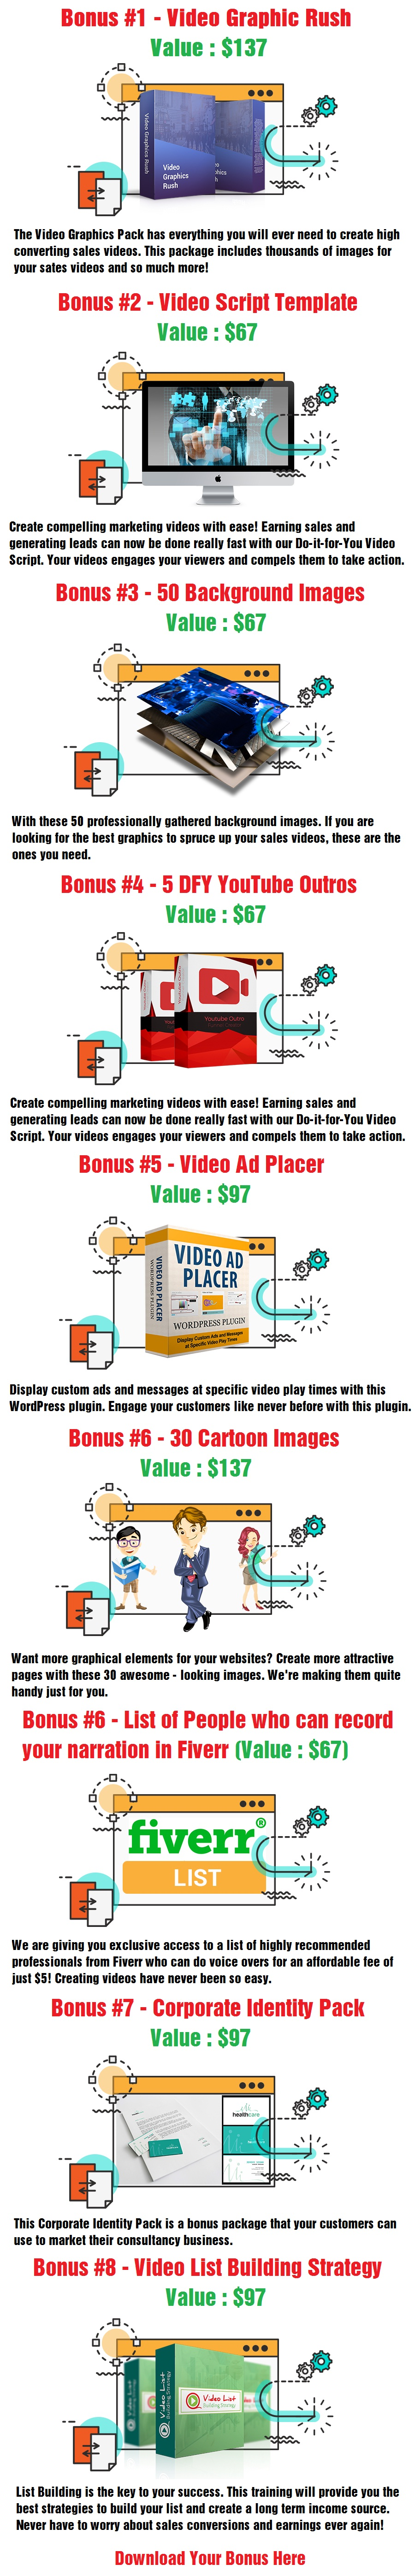 Video Rubix Bonus